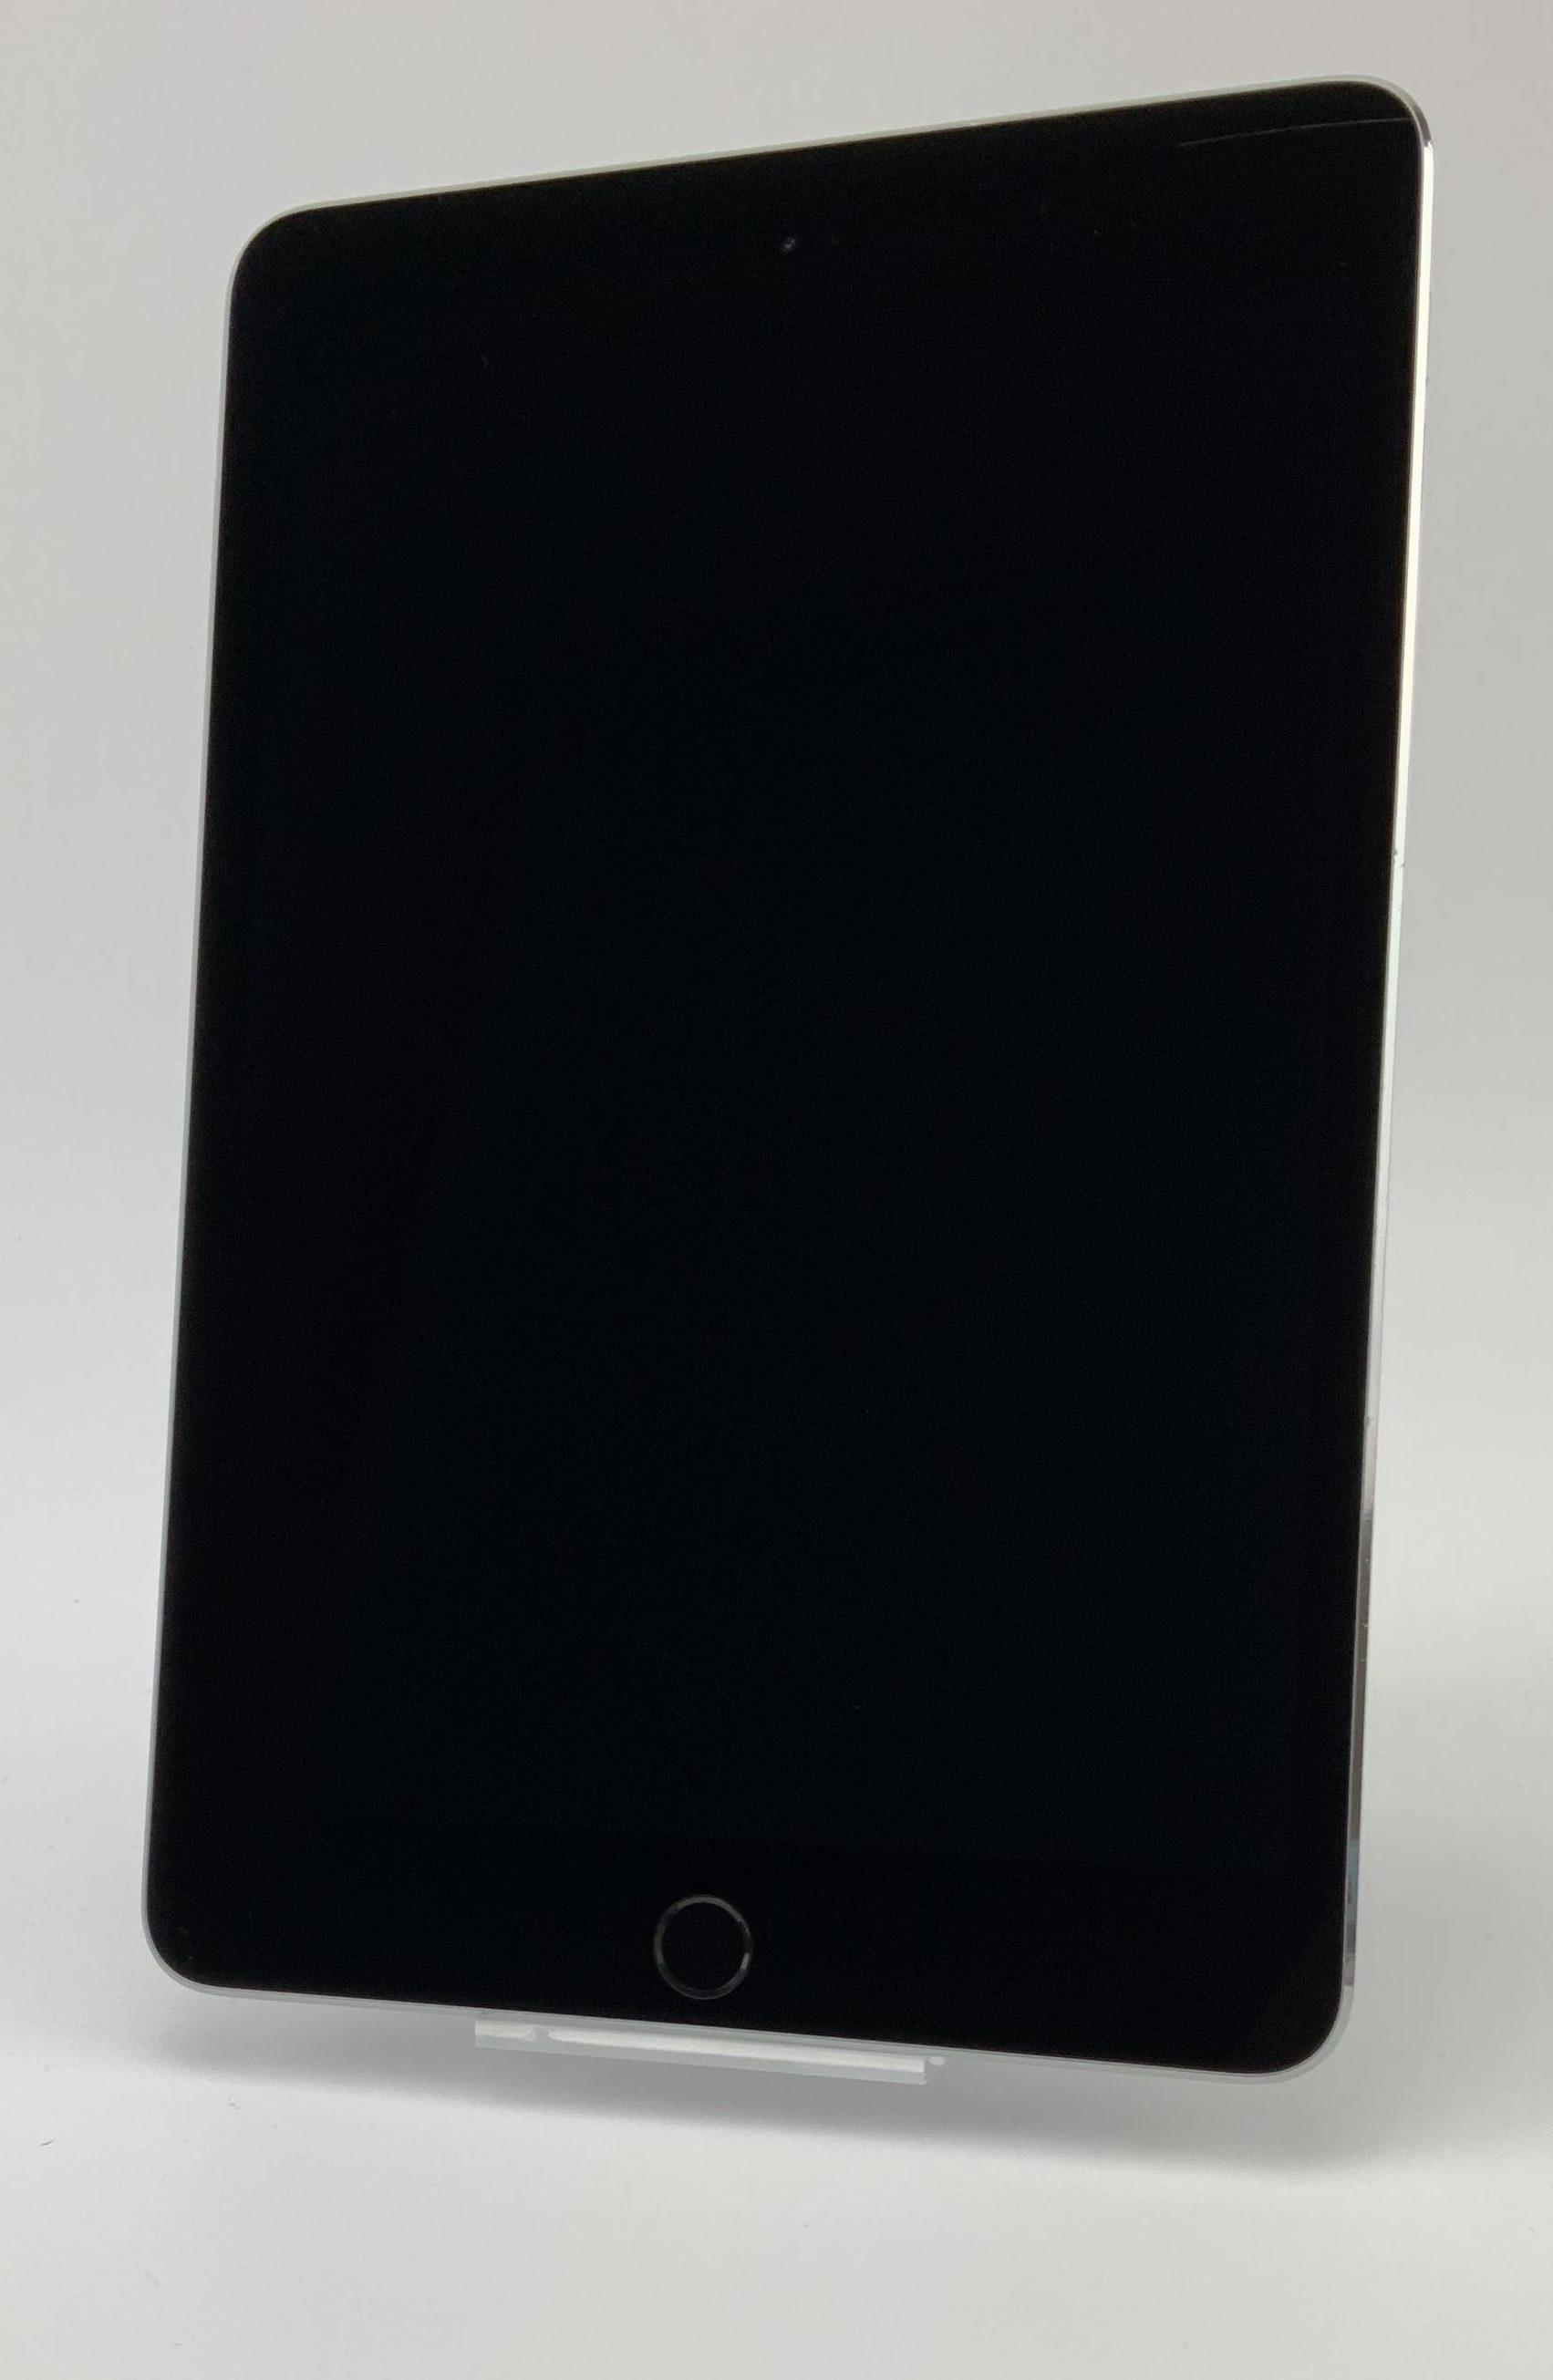 iPad mini 4 Wi-Fi 32GB, 32GB, Space Gray, immagine 1